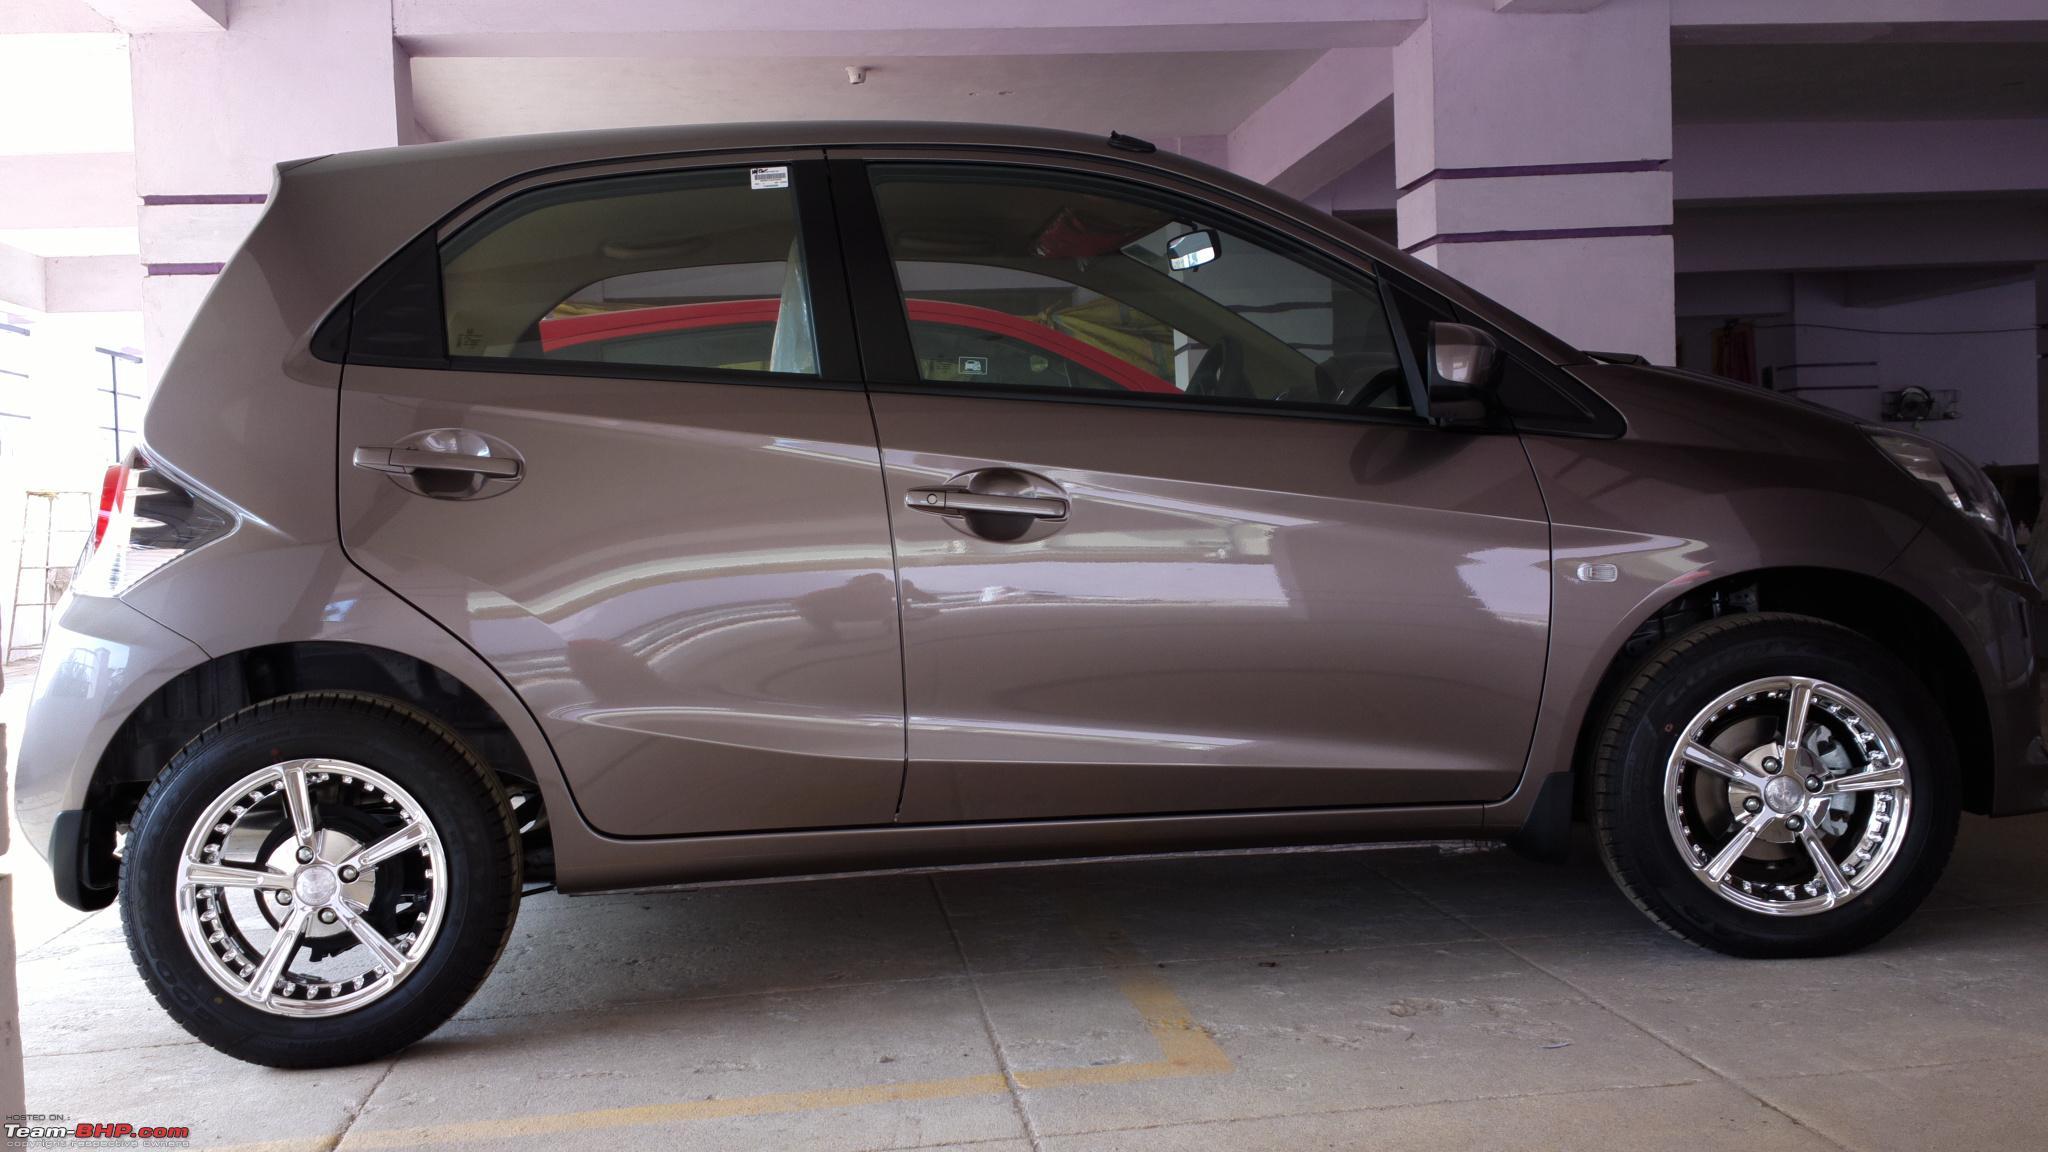 Honda brio test drive review side view brio jpg